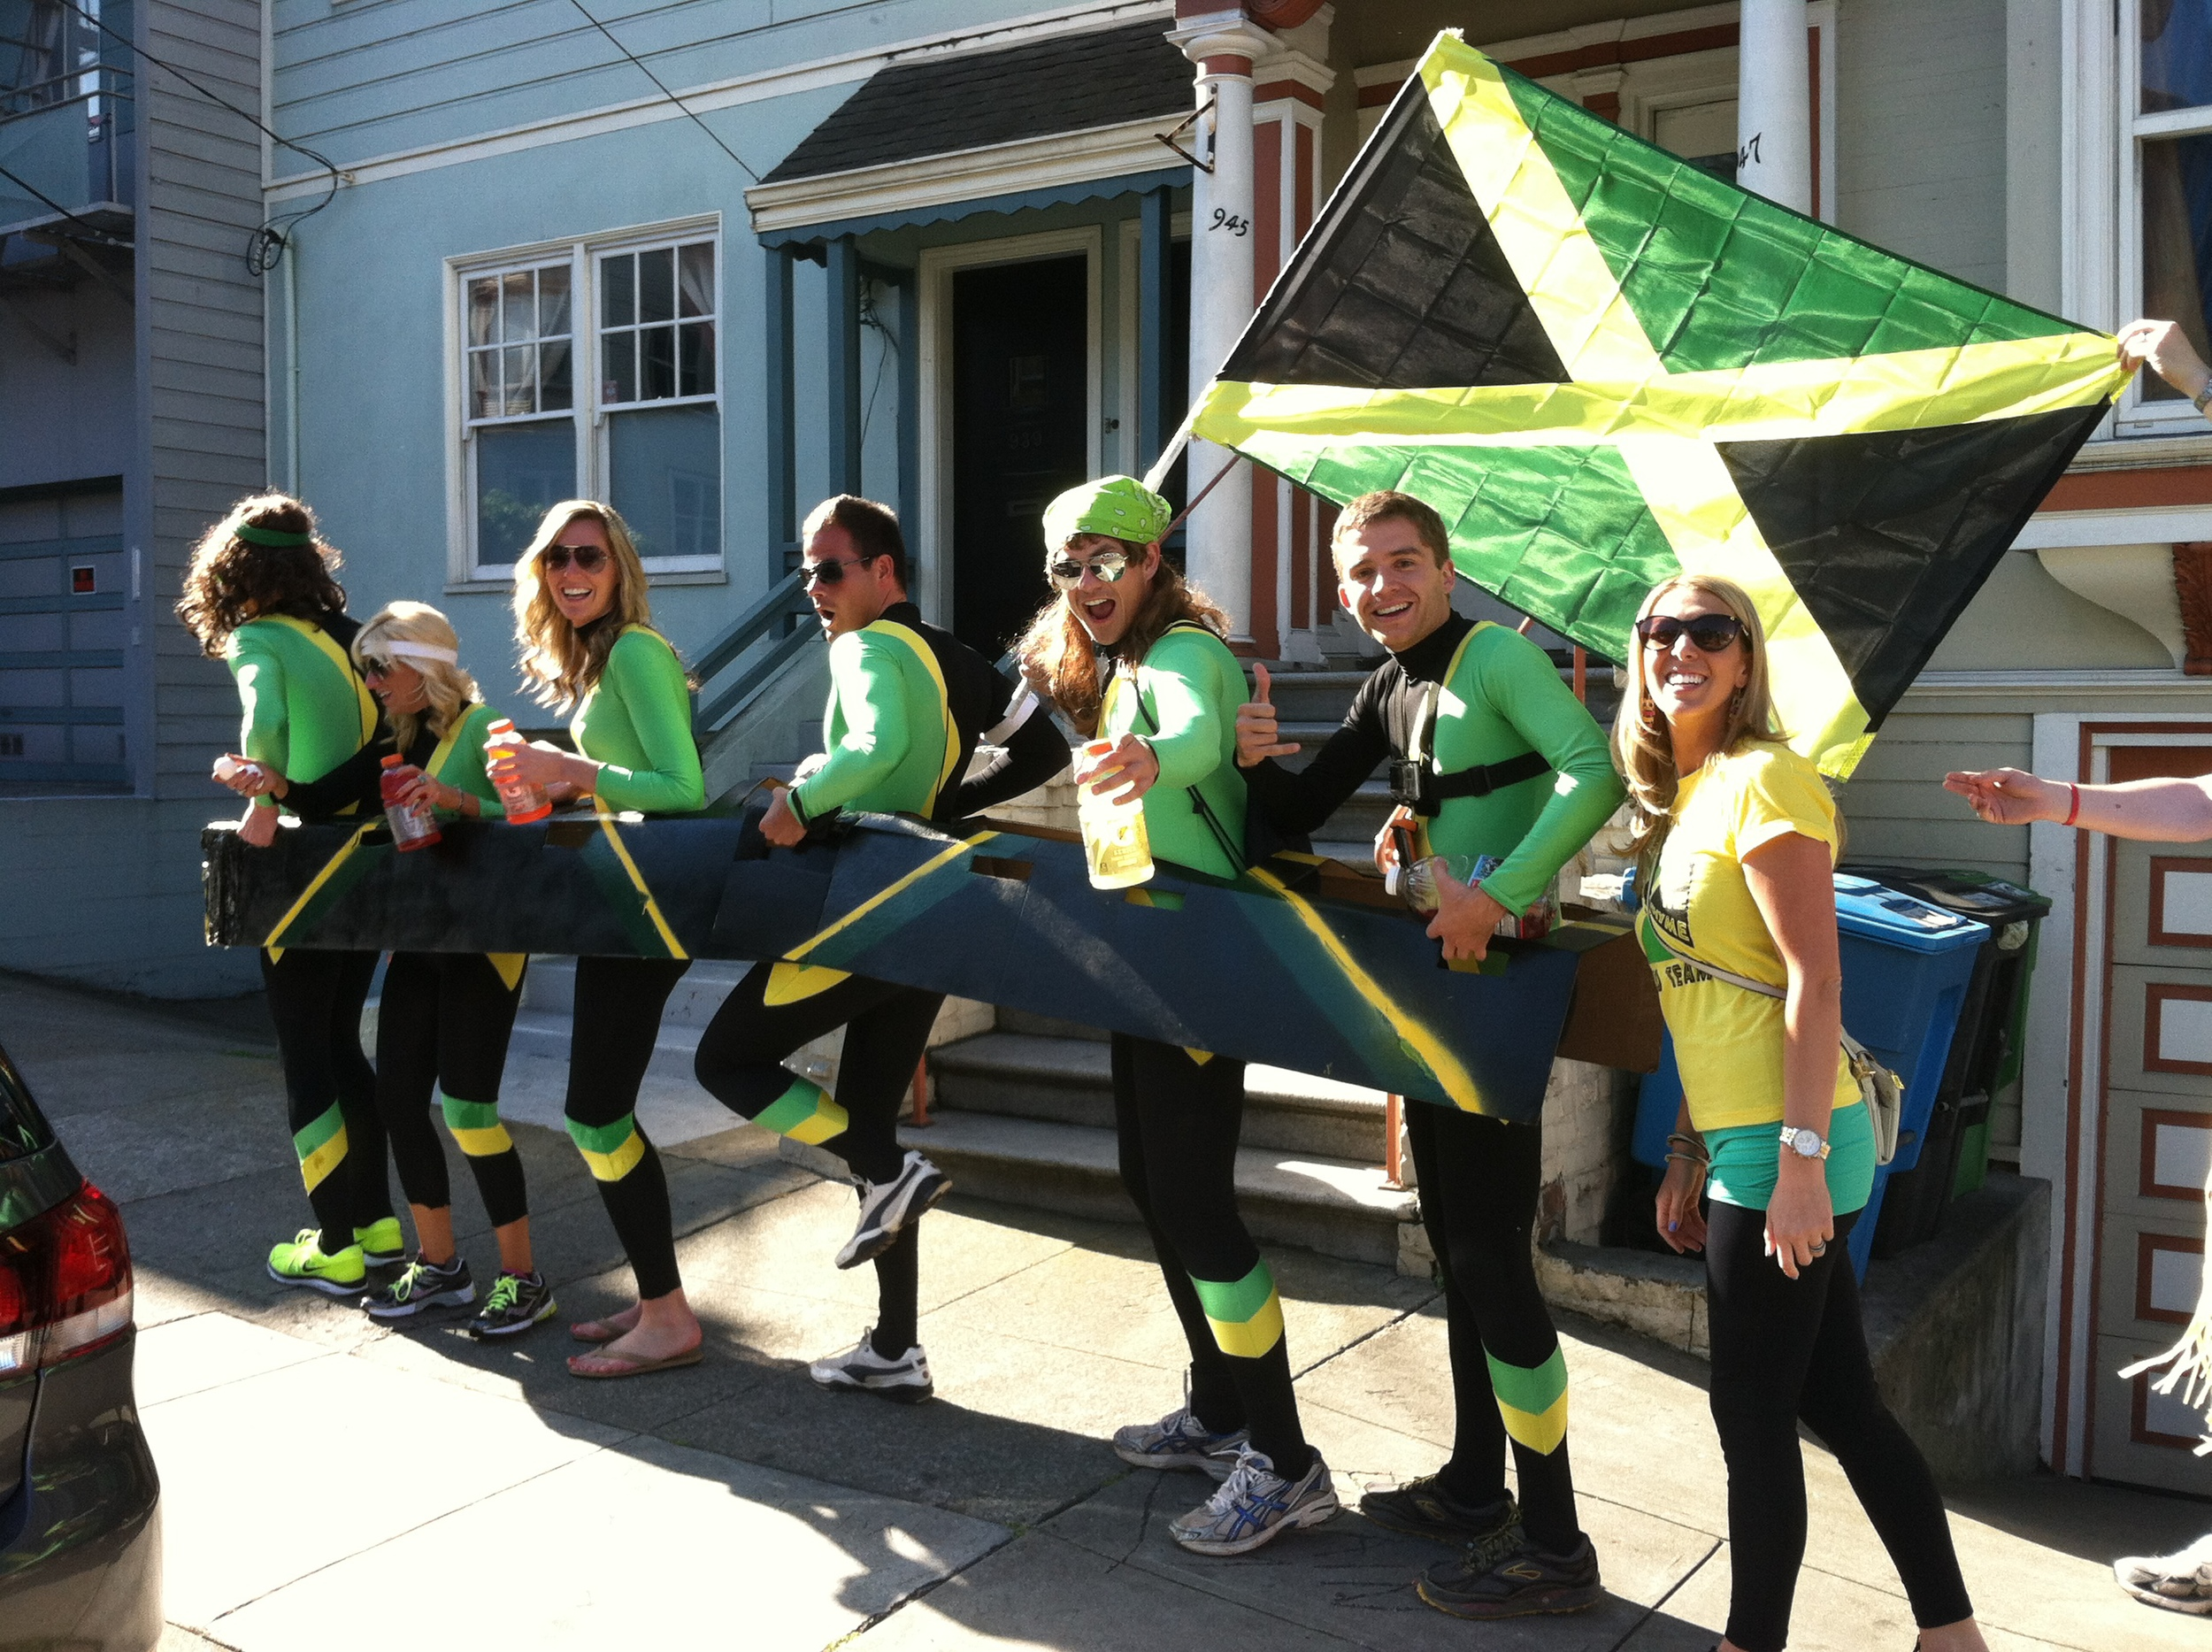 Jamaican Bobsled team!